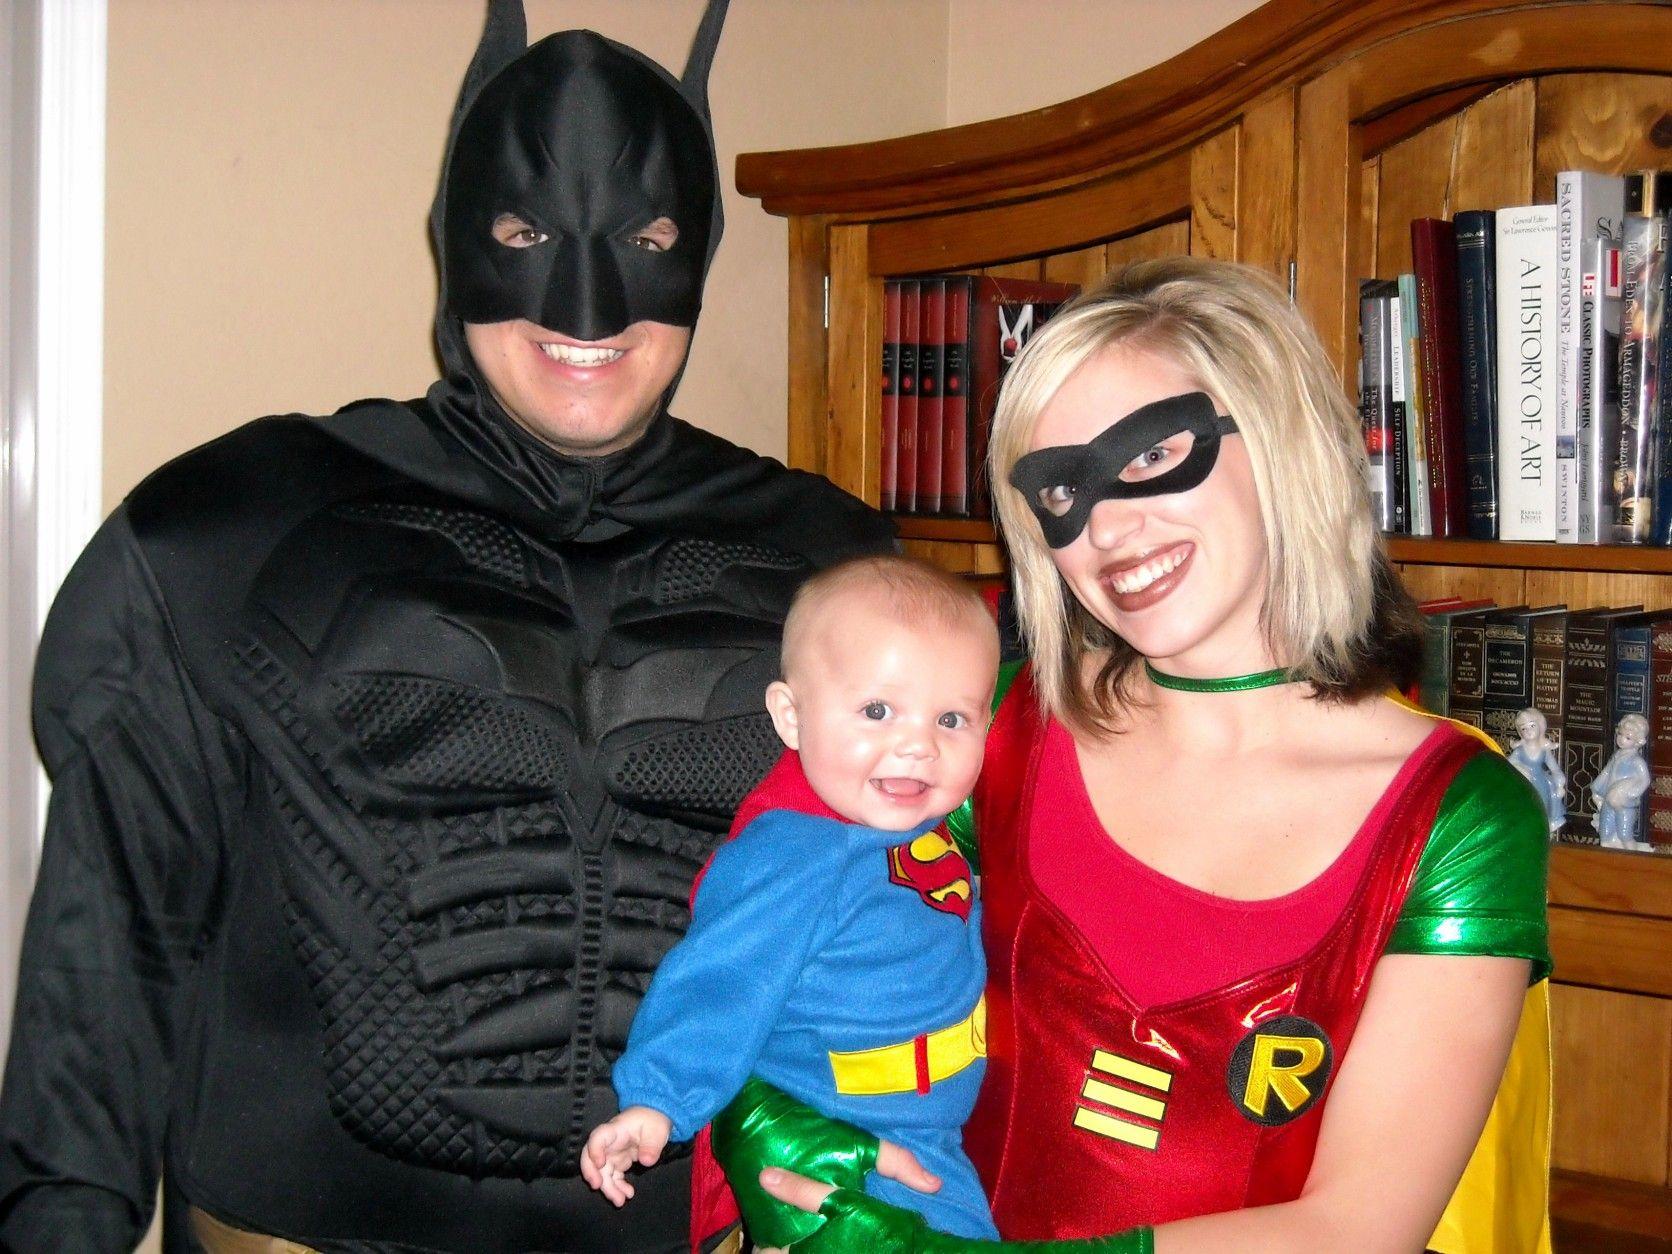 Hoop Hangout - Halloween - Family of Three Costumes - Super Hero ...